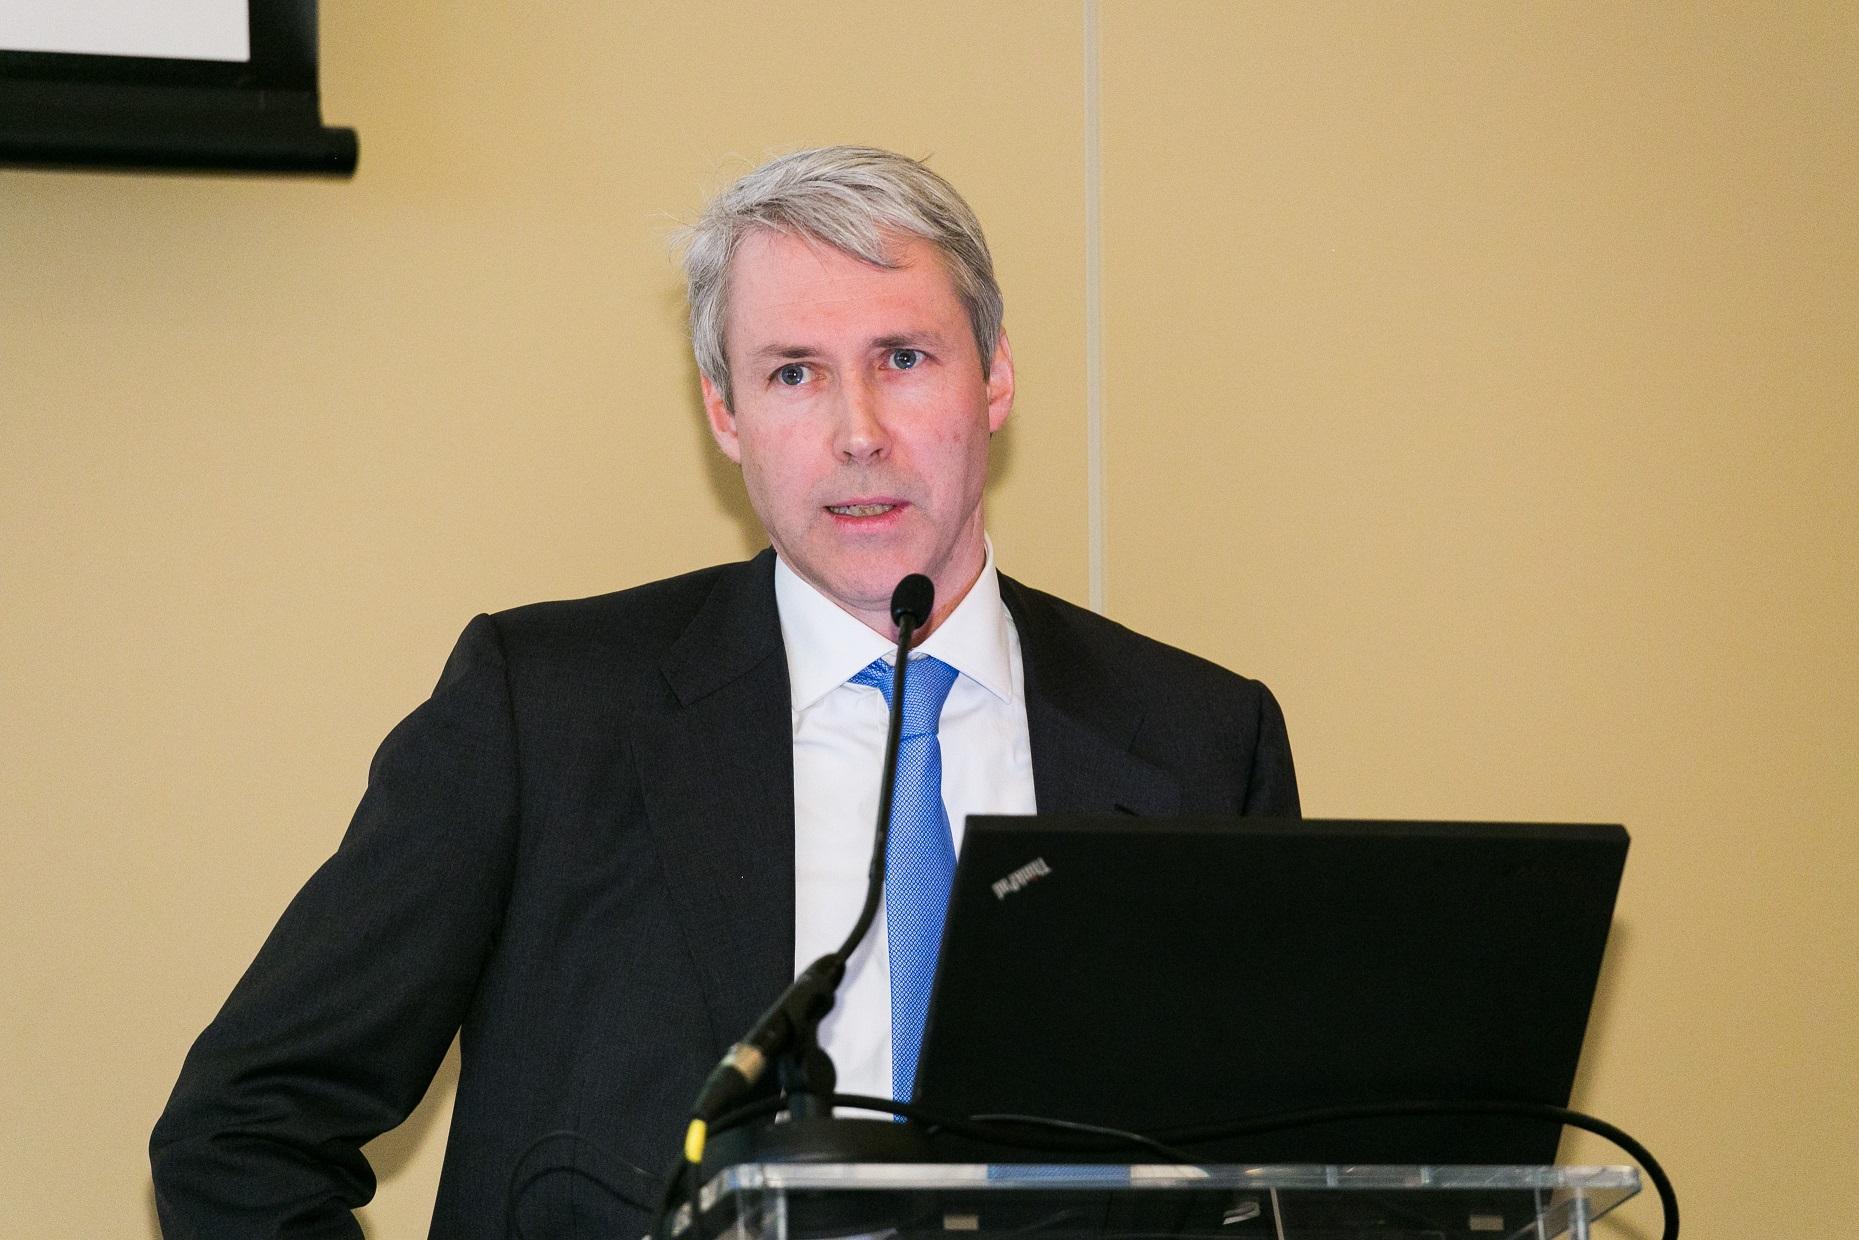 Referent Matthias Öhler